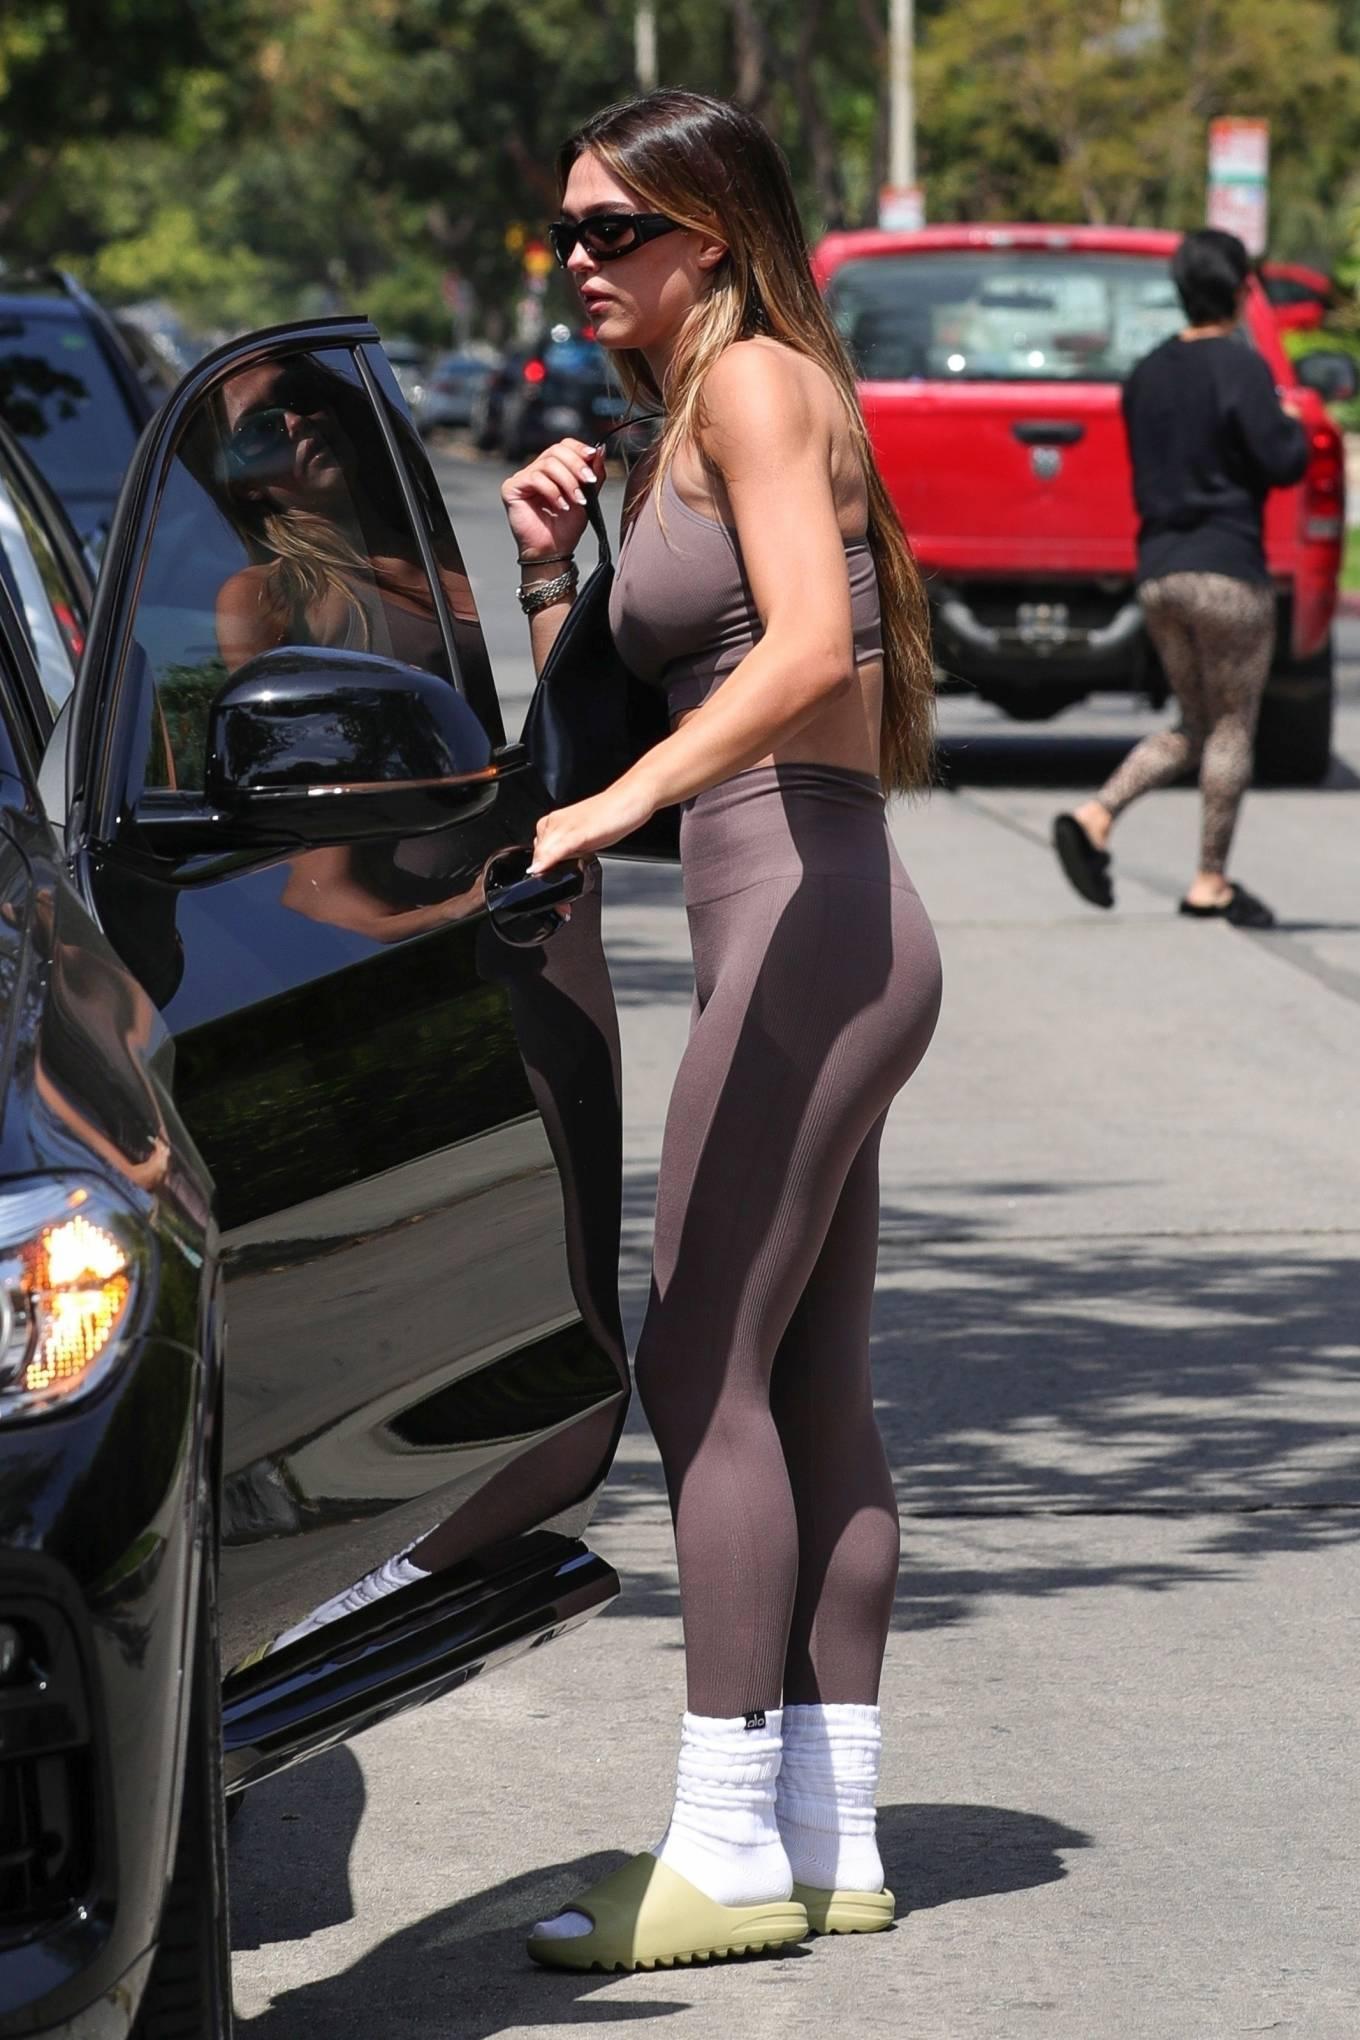 Amelia Gray Hamlin 2021 : Amelia Gray Hamlin – In SETactive workout wear and Yeezy slides in West Hollywood-24